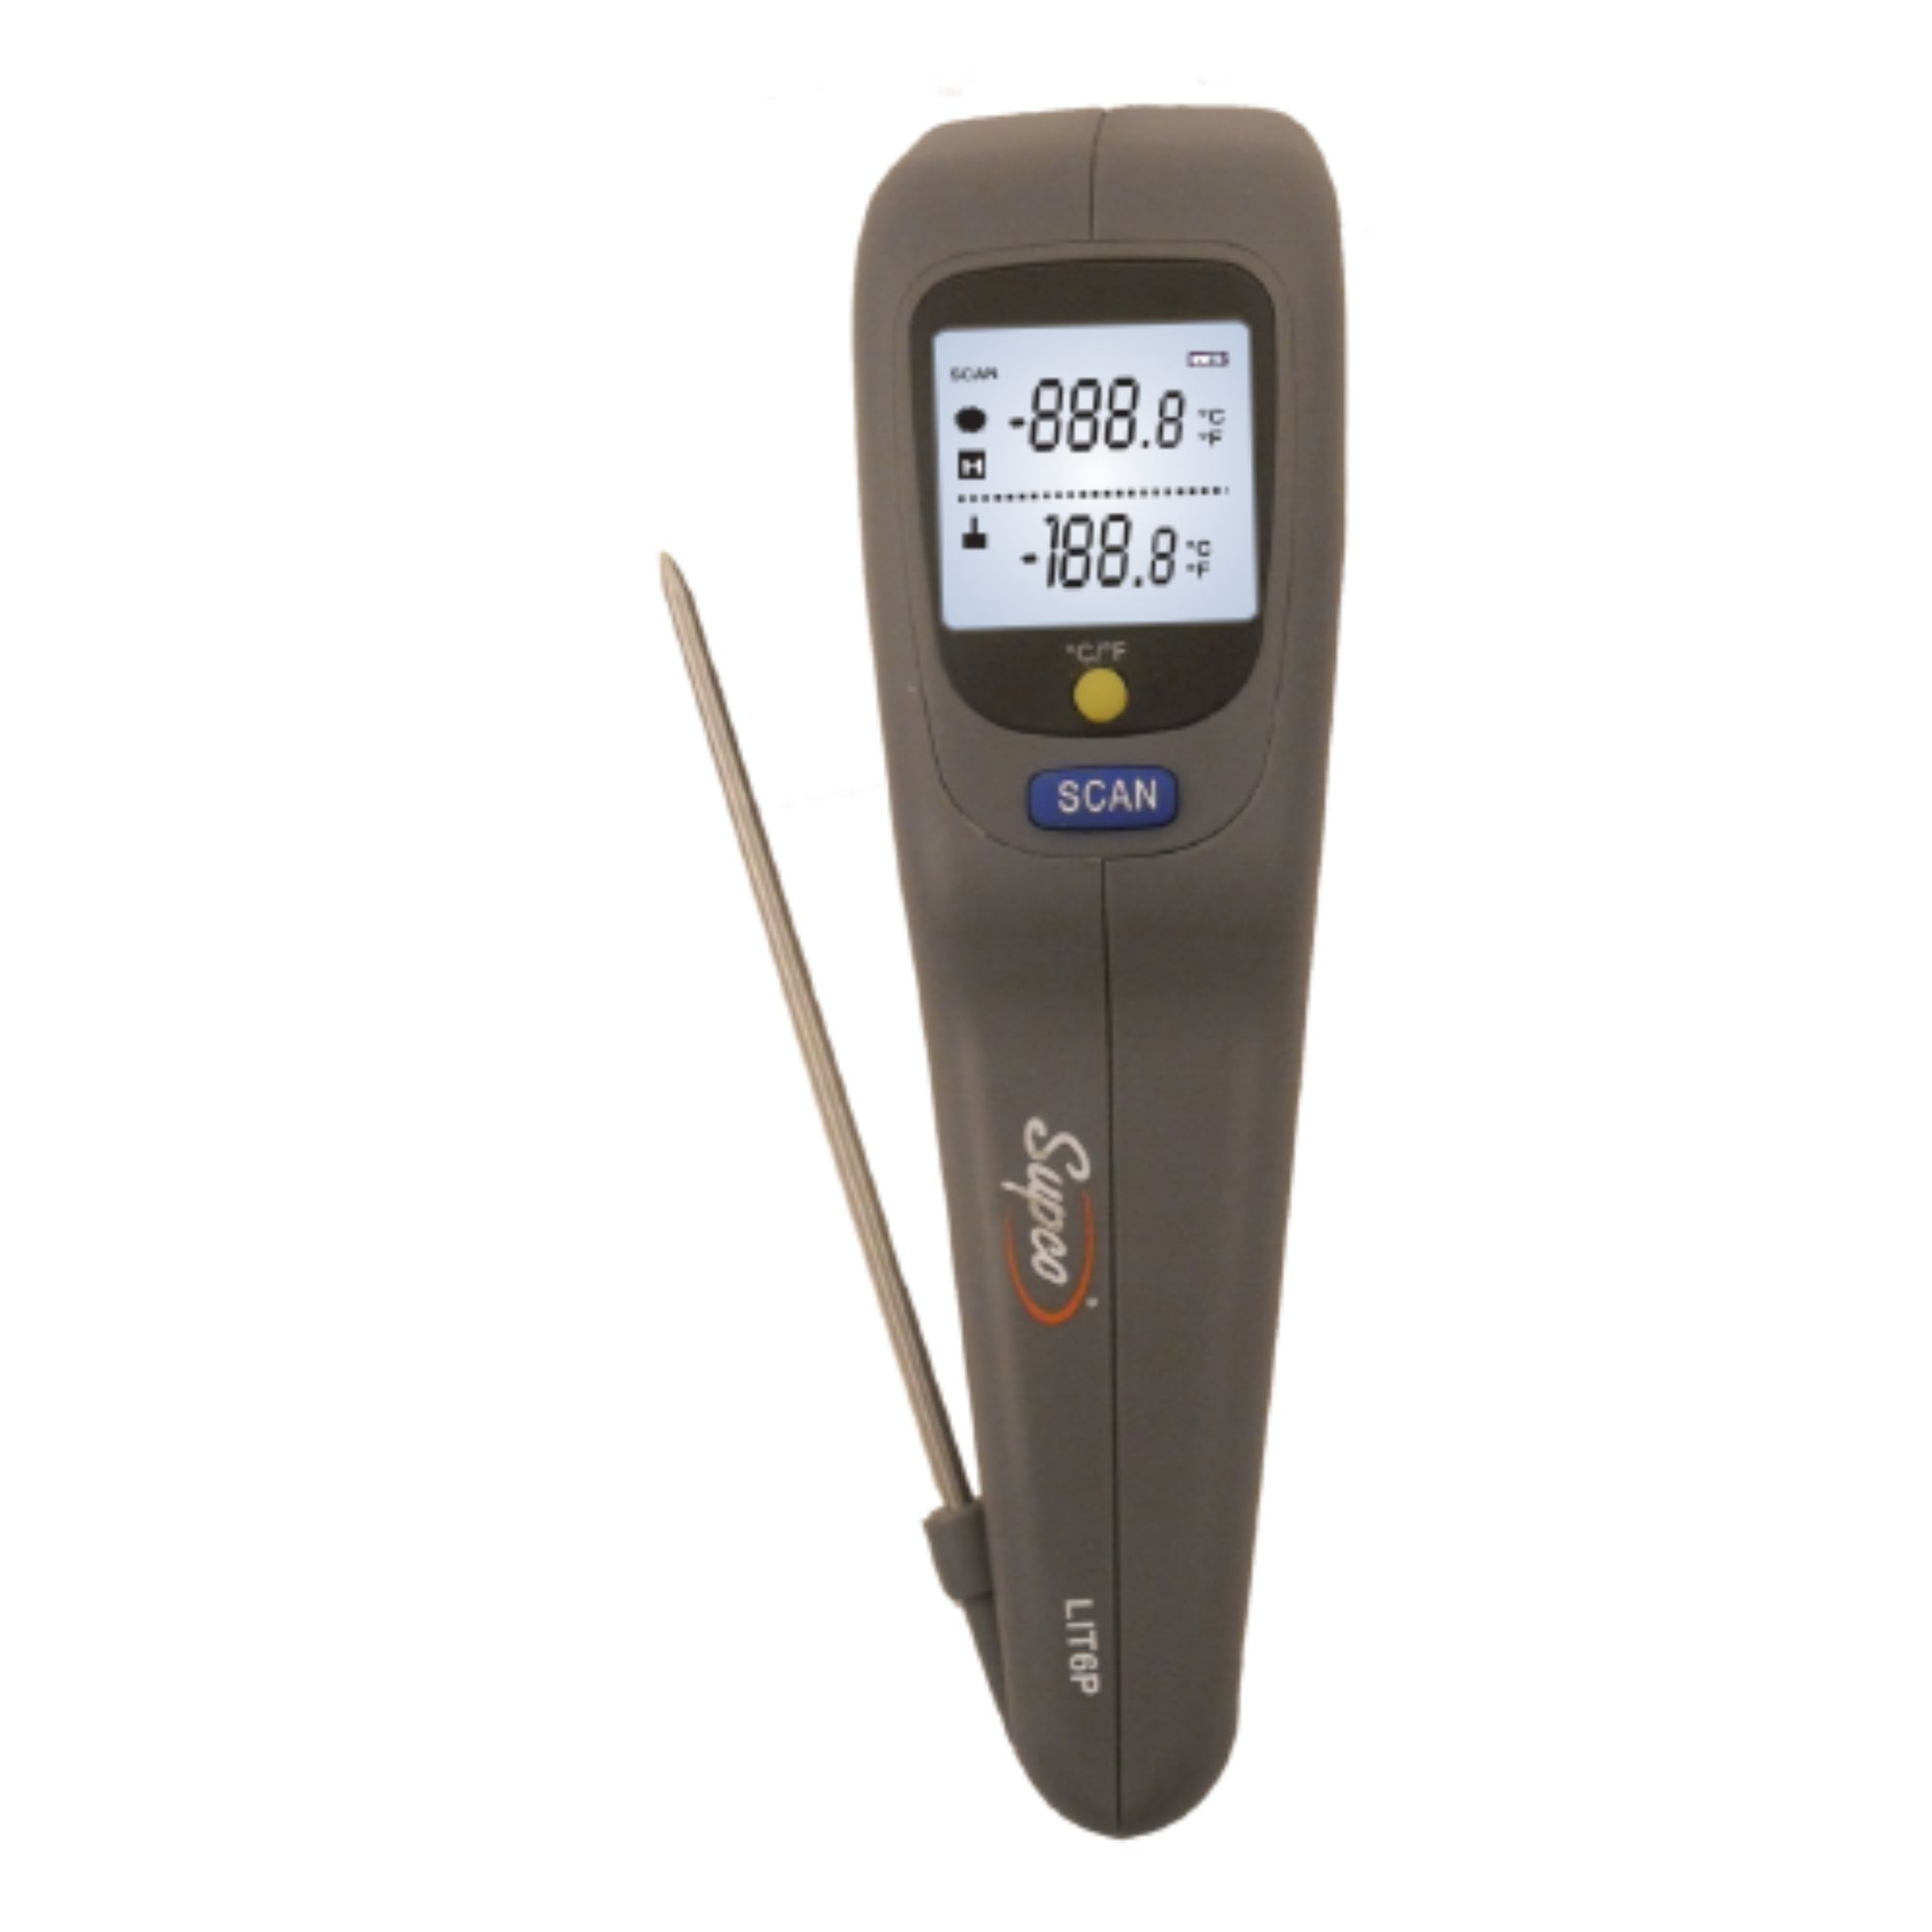 LIT6P Genuine OEM Supco Infrared Thermometer W/ Probe